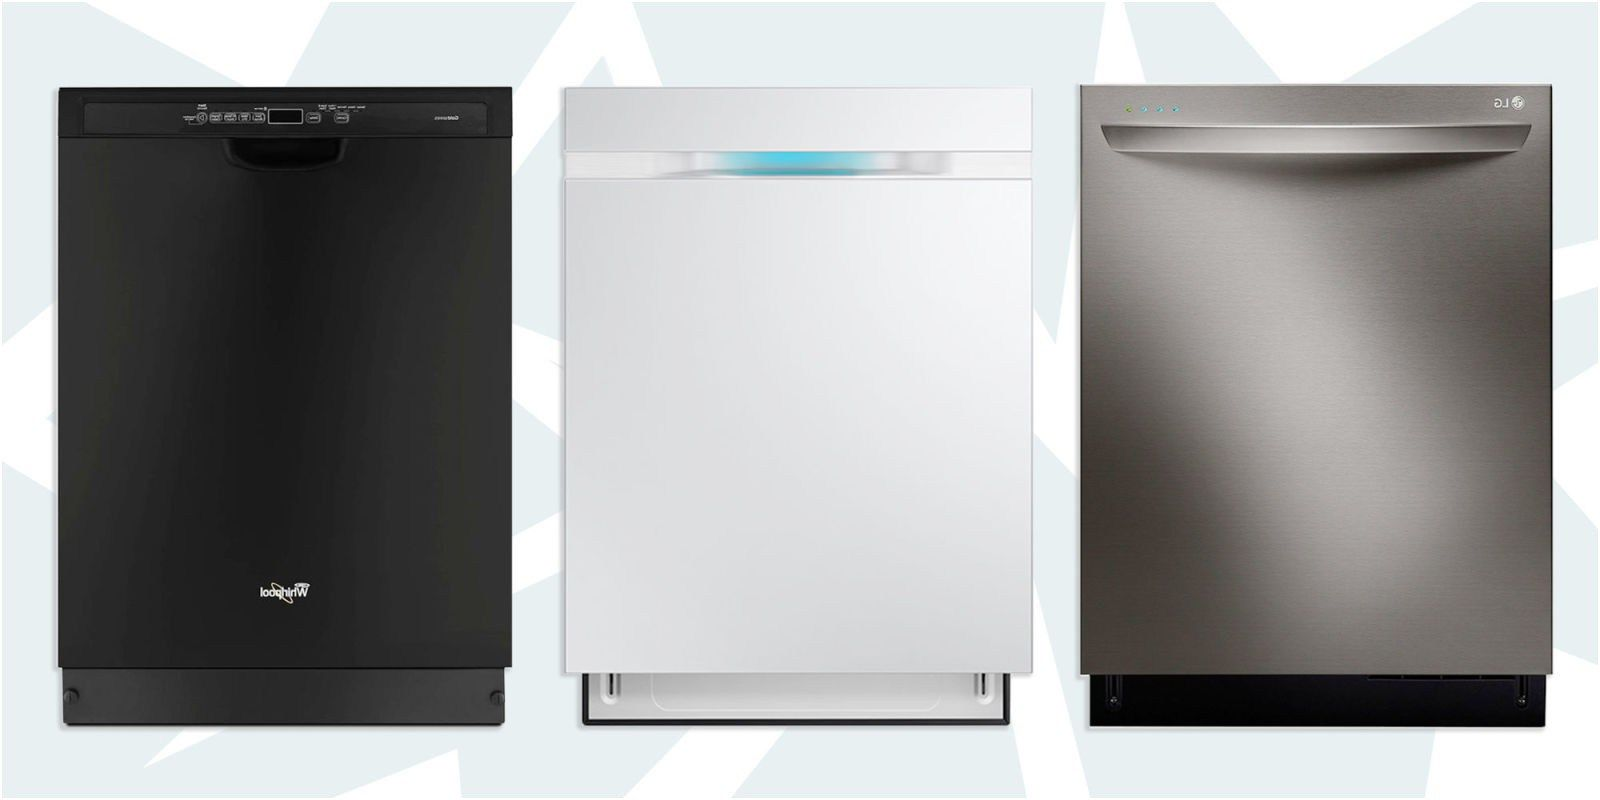 100 best kitchen appliances gad s 2017 reviews of kitchen from ...